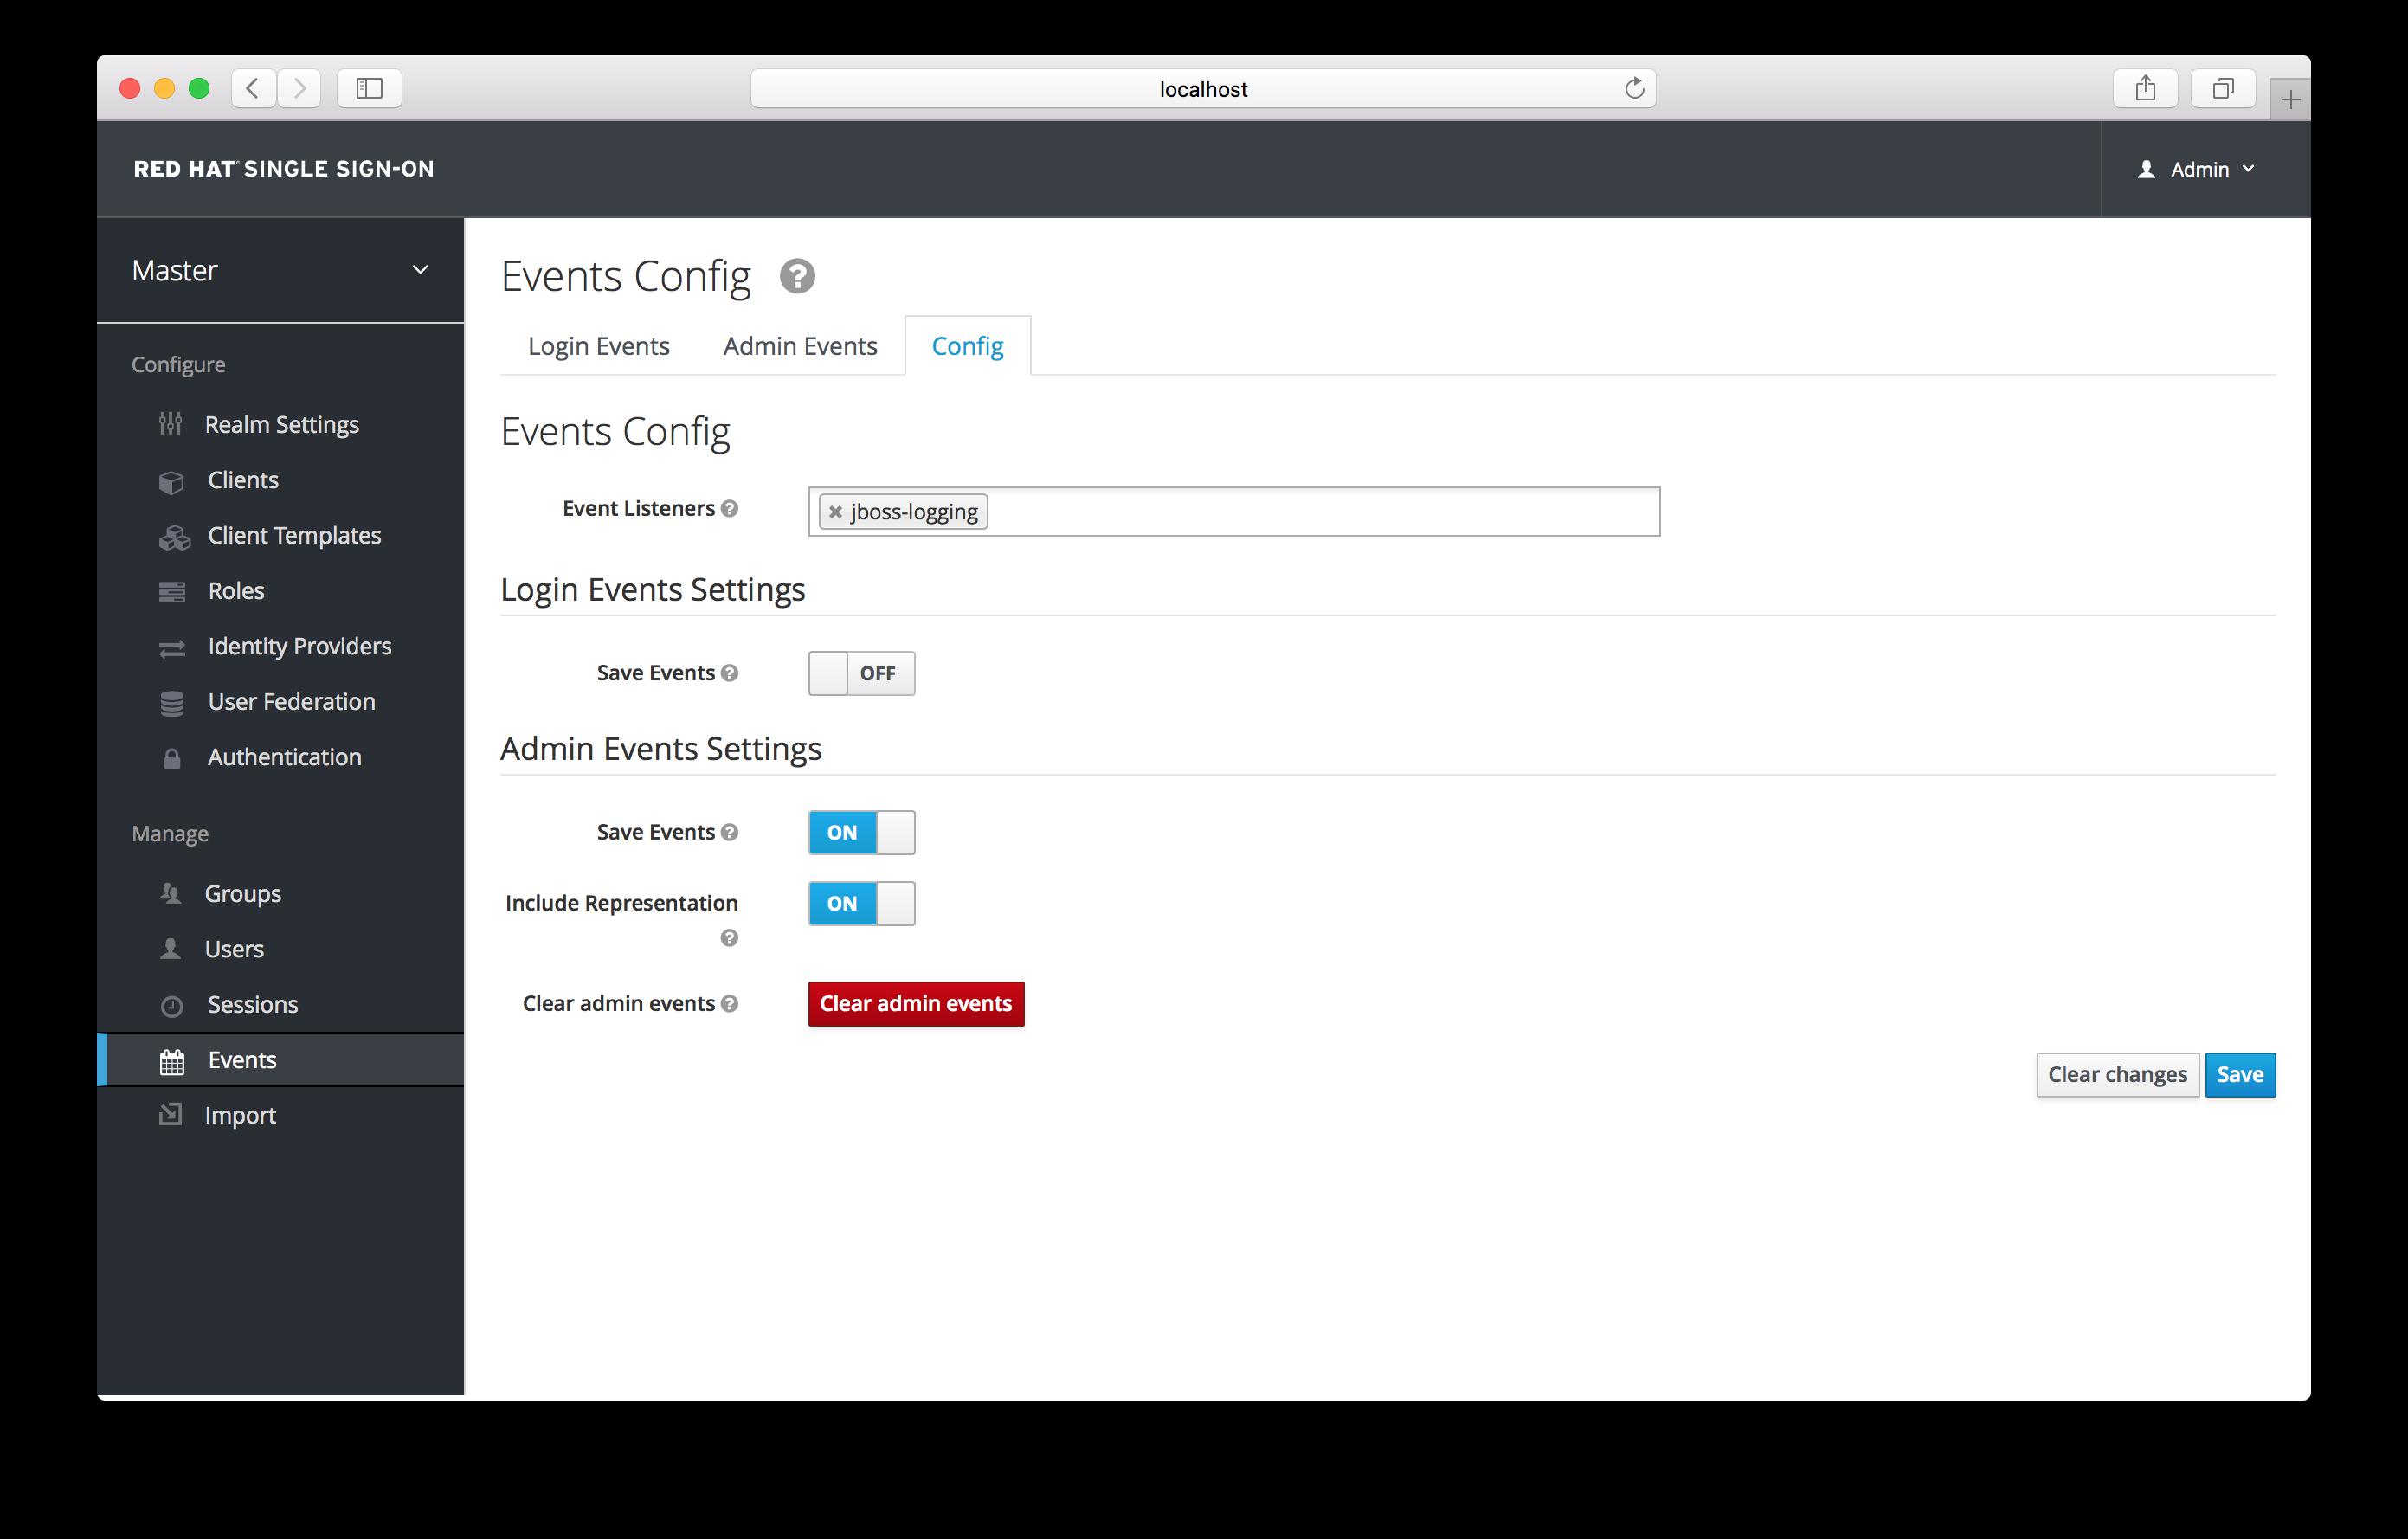 admin events settings